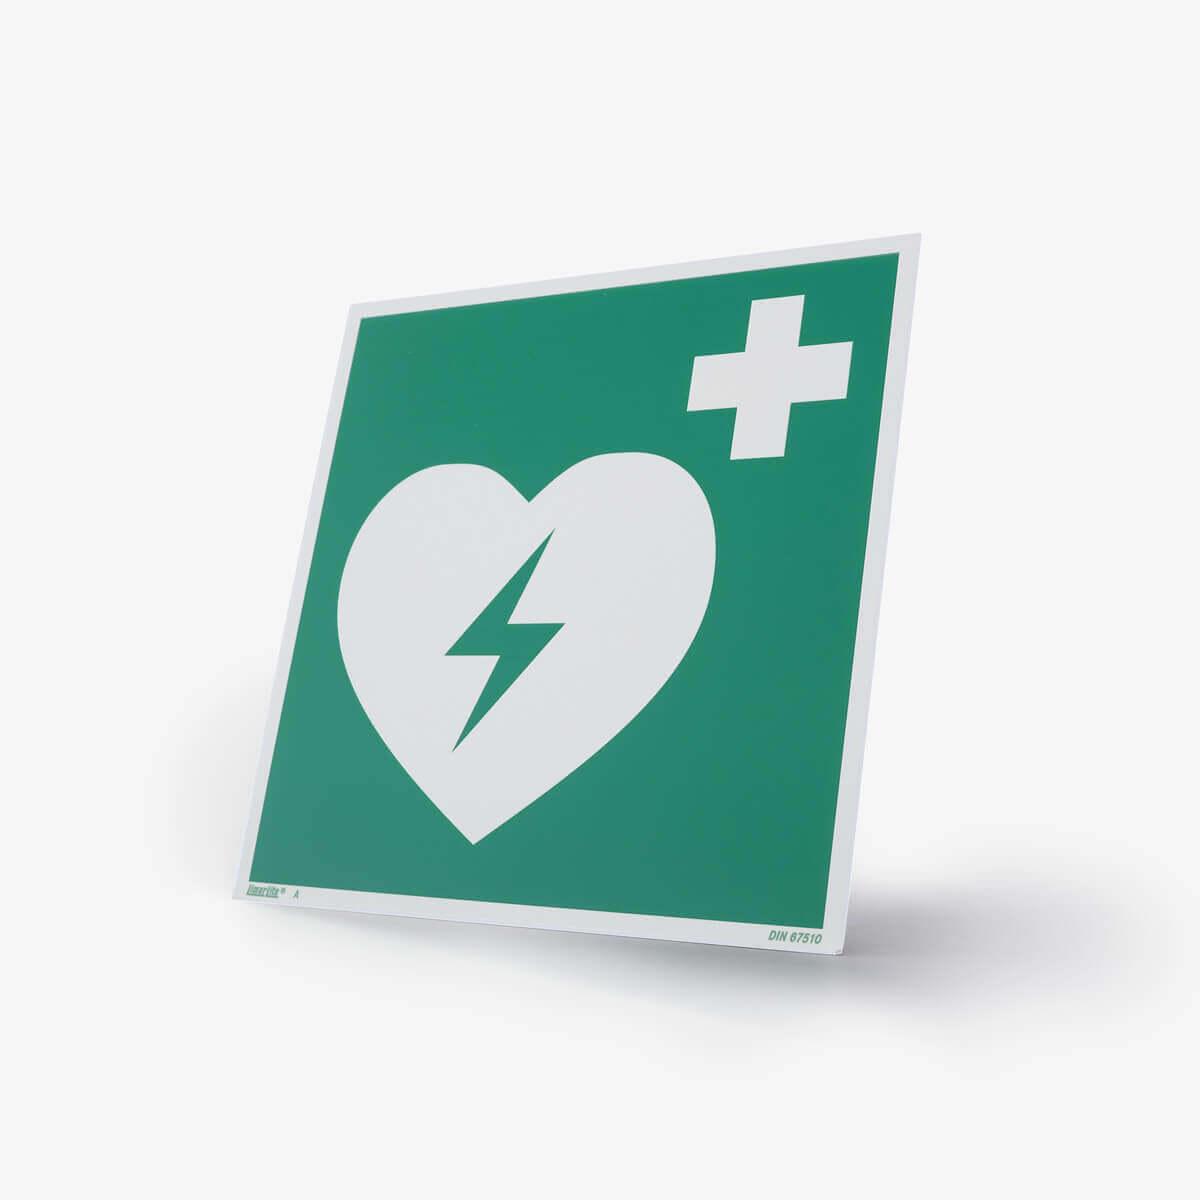 Hinweistafel mit AED Symol